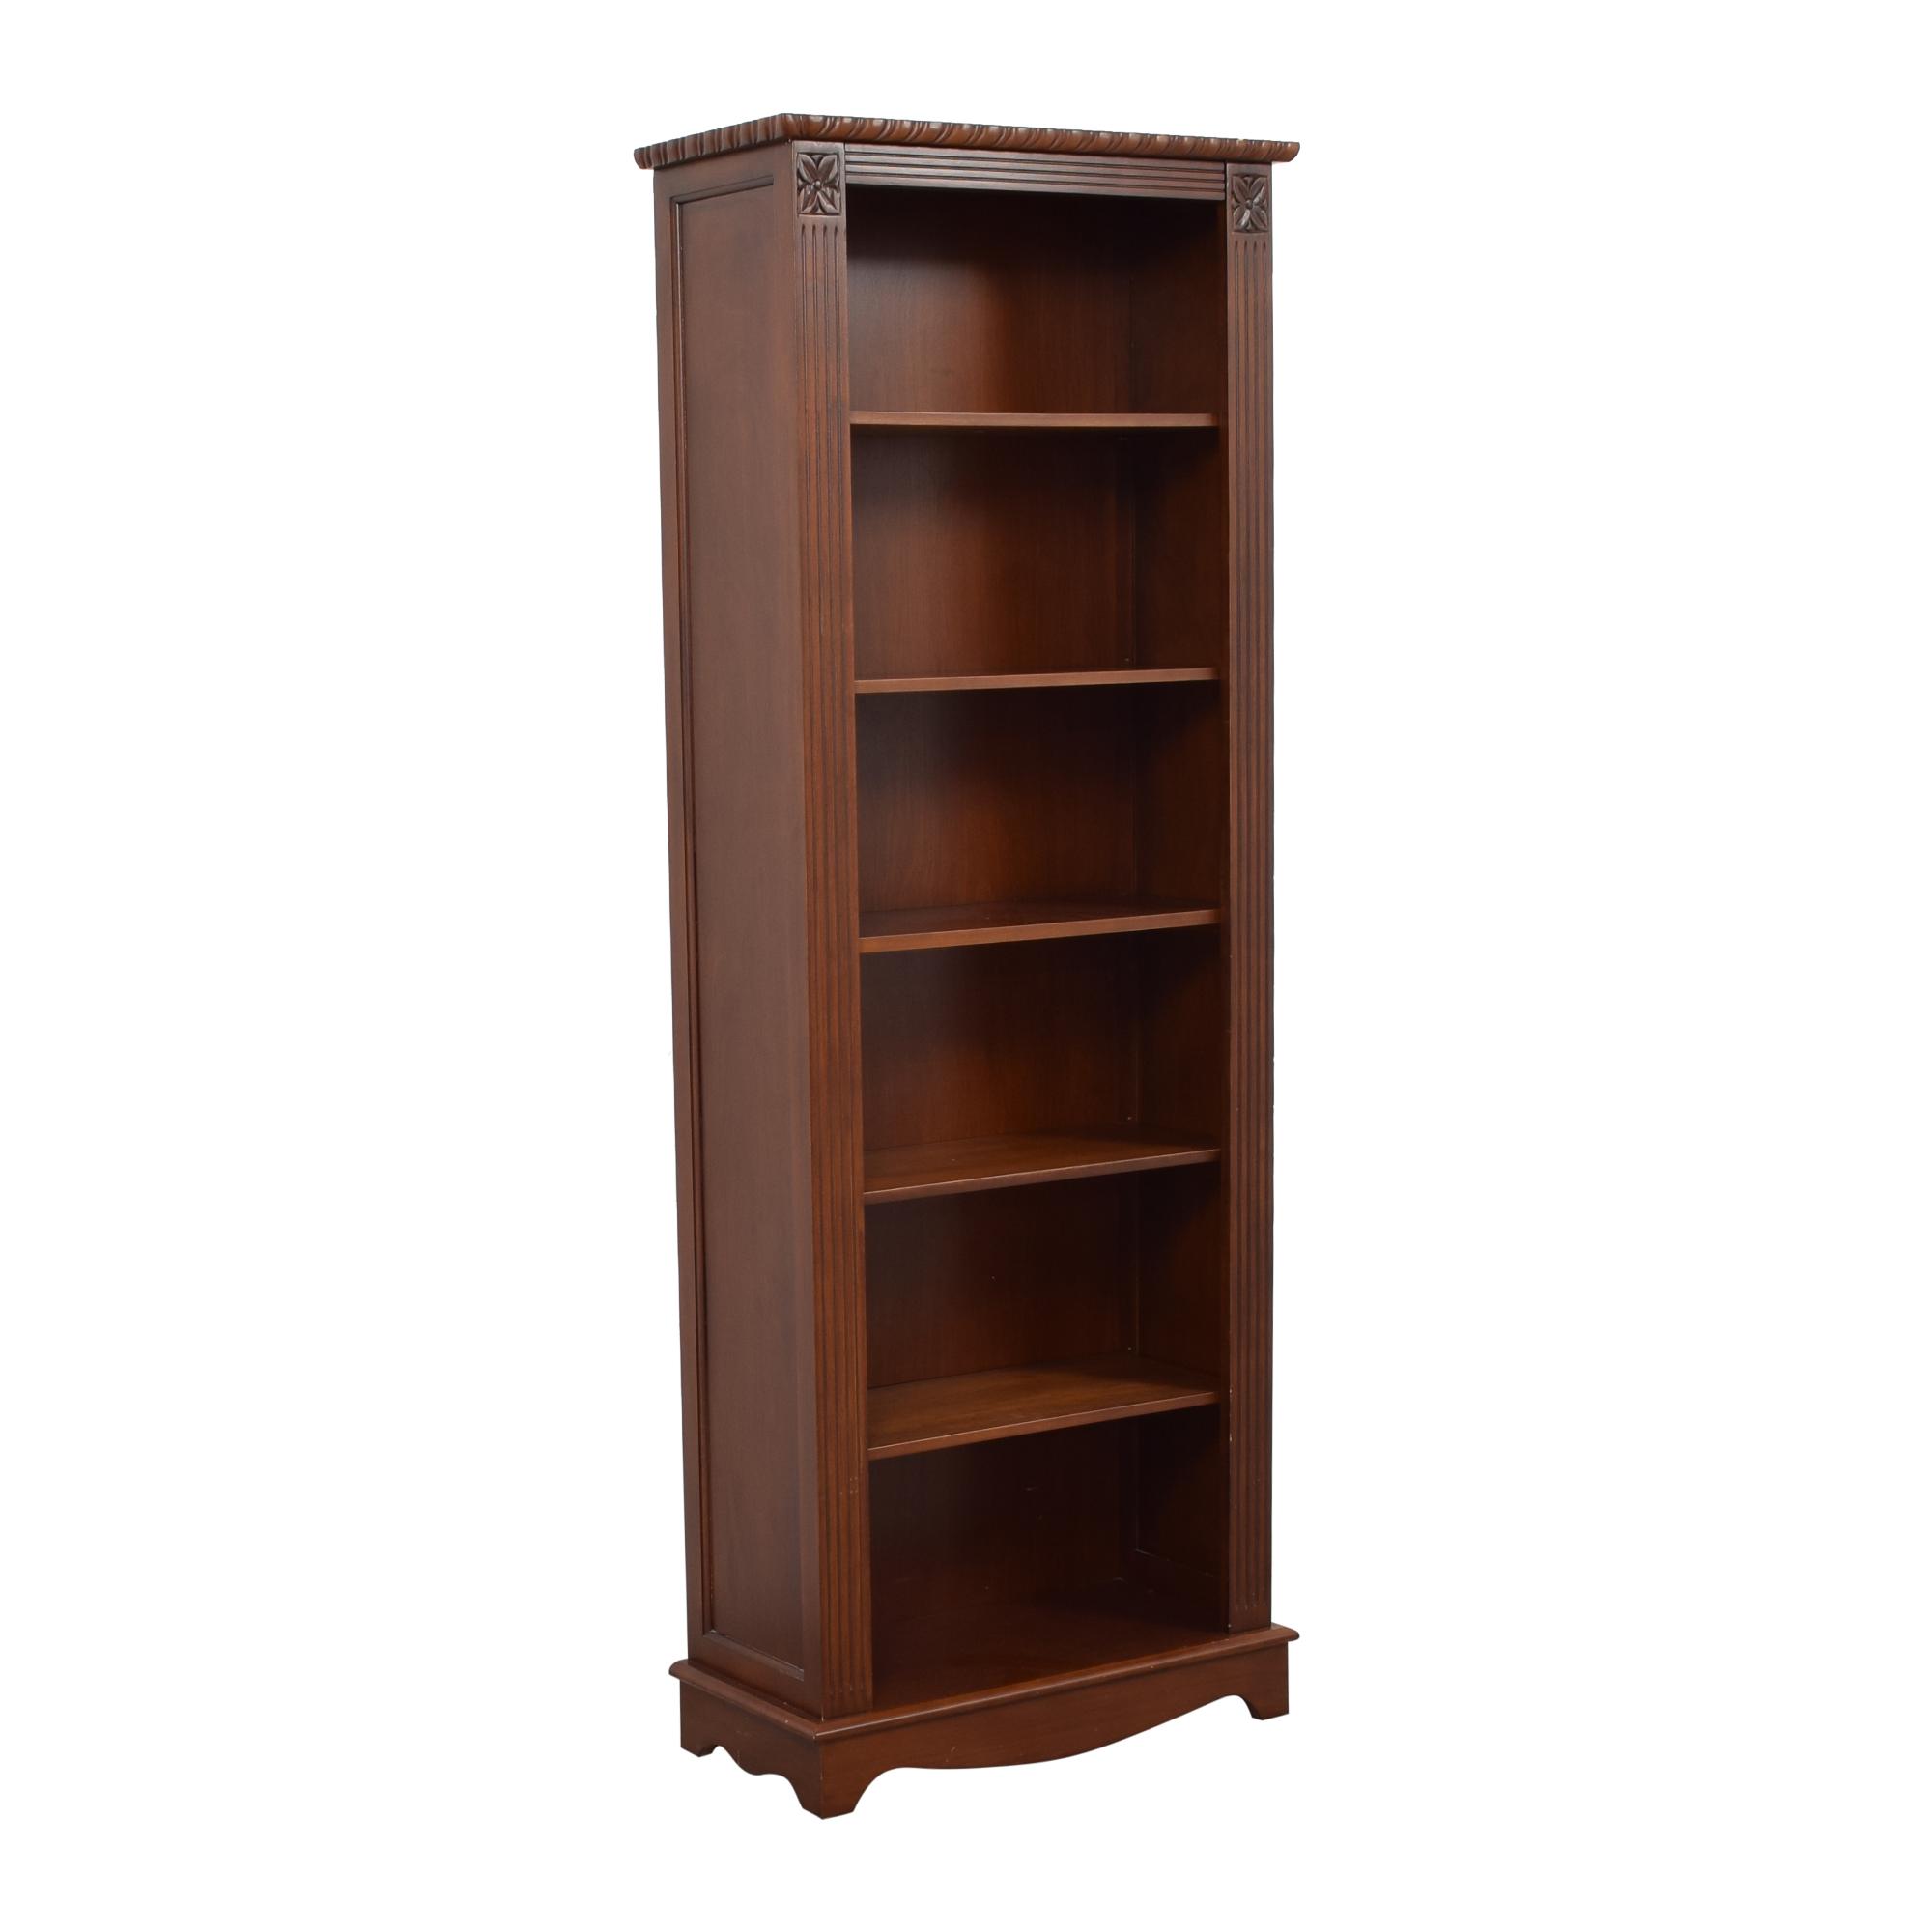 Tall Six Shelf Bookcase brown